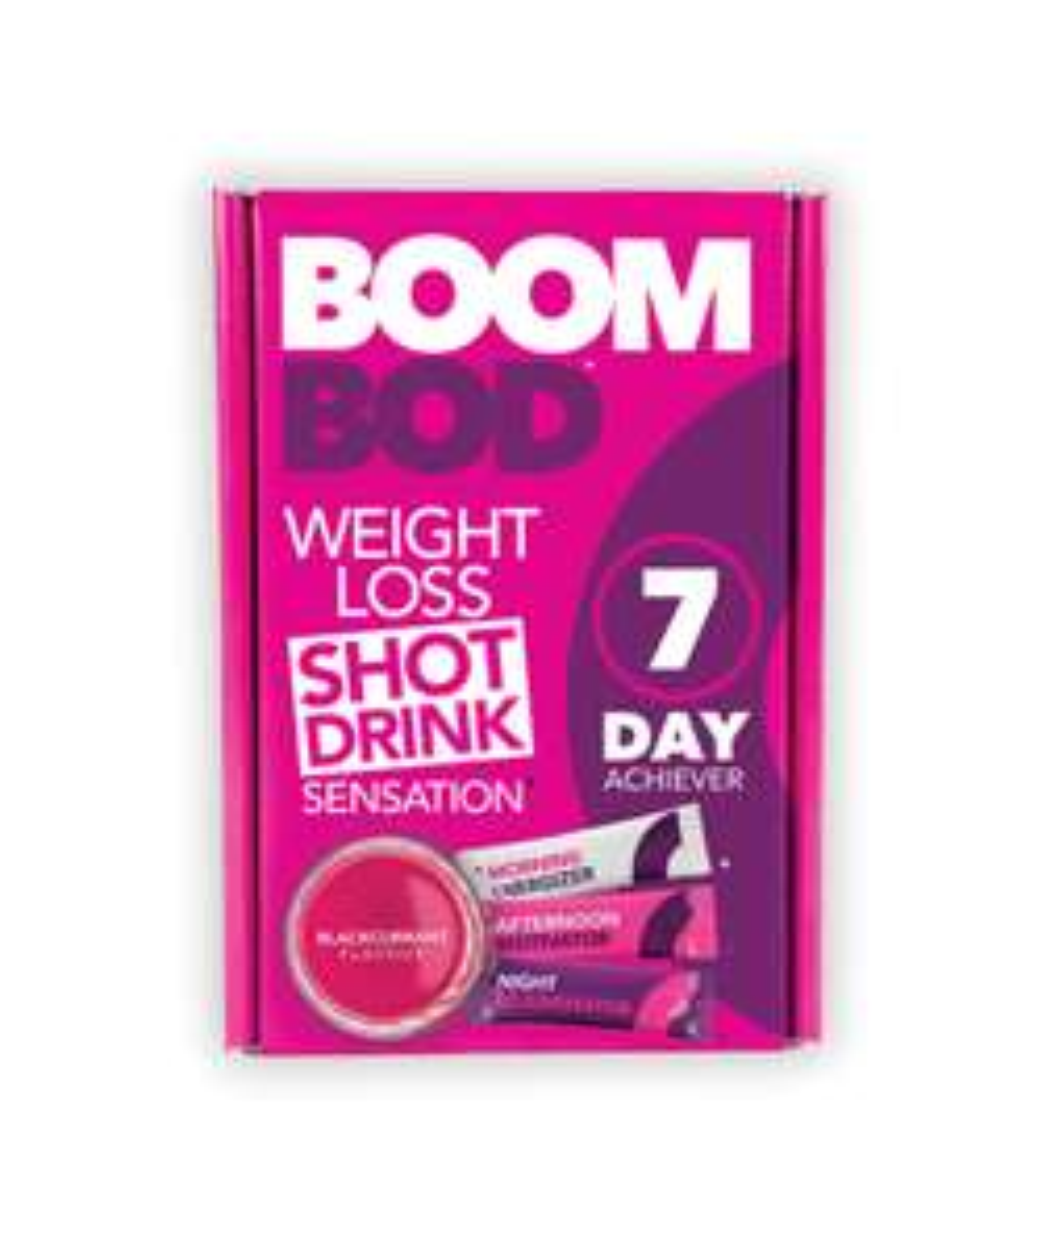 Boombod at Holland & Barrett - Better than Half Price for £14.49 (free C&C)